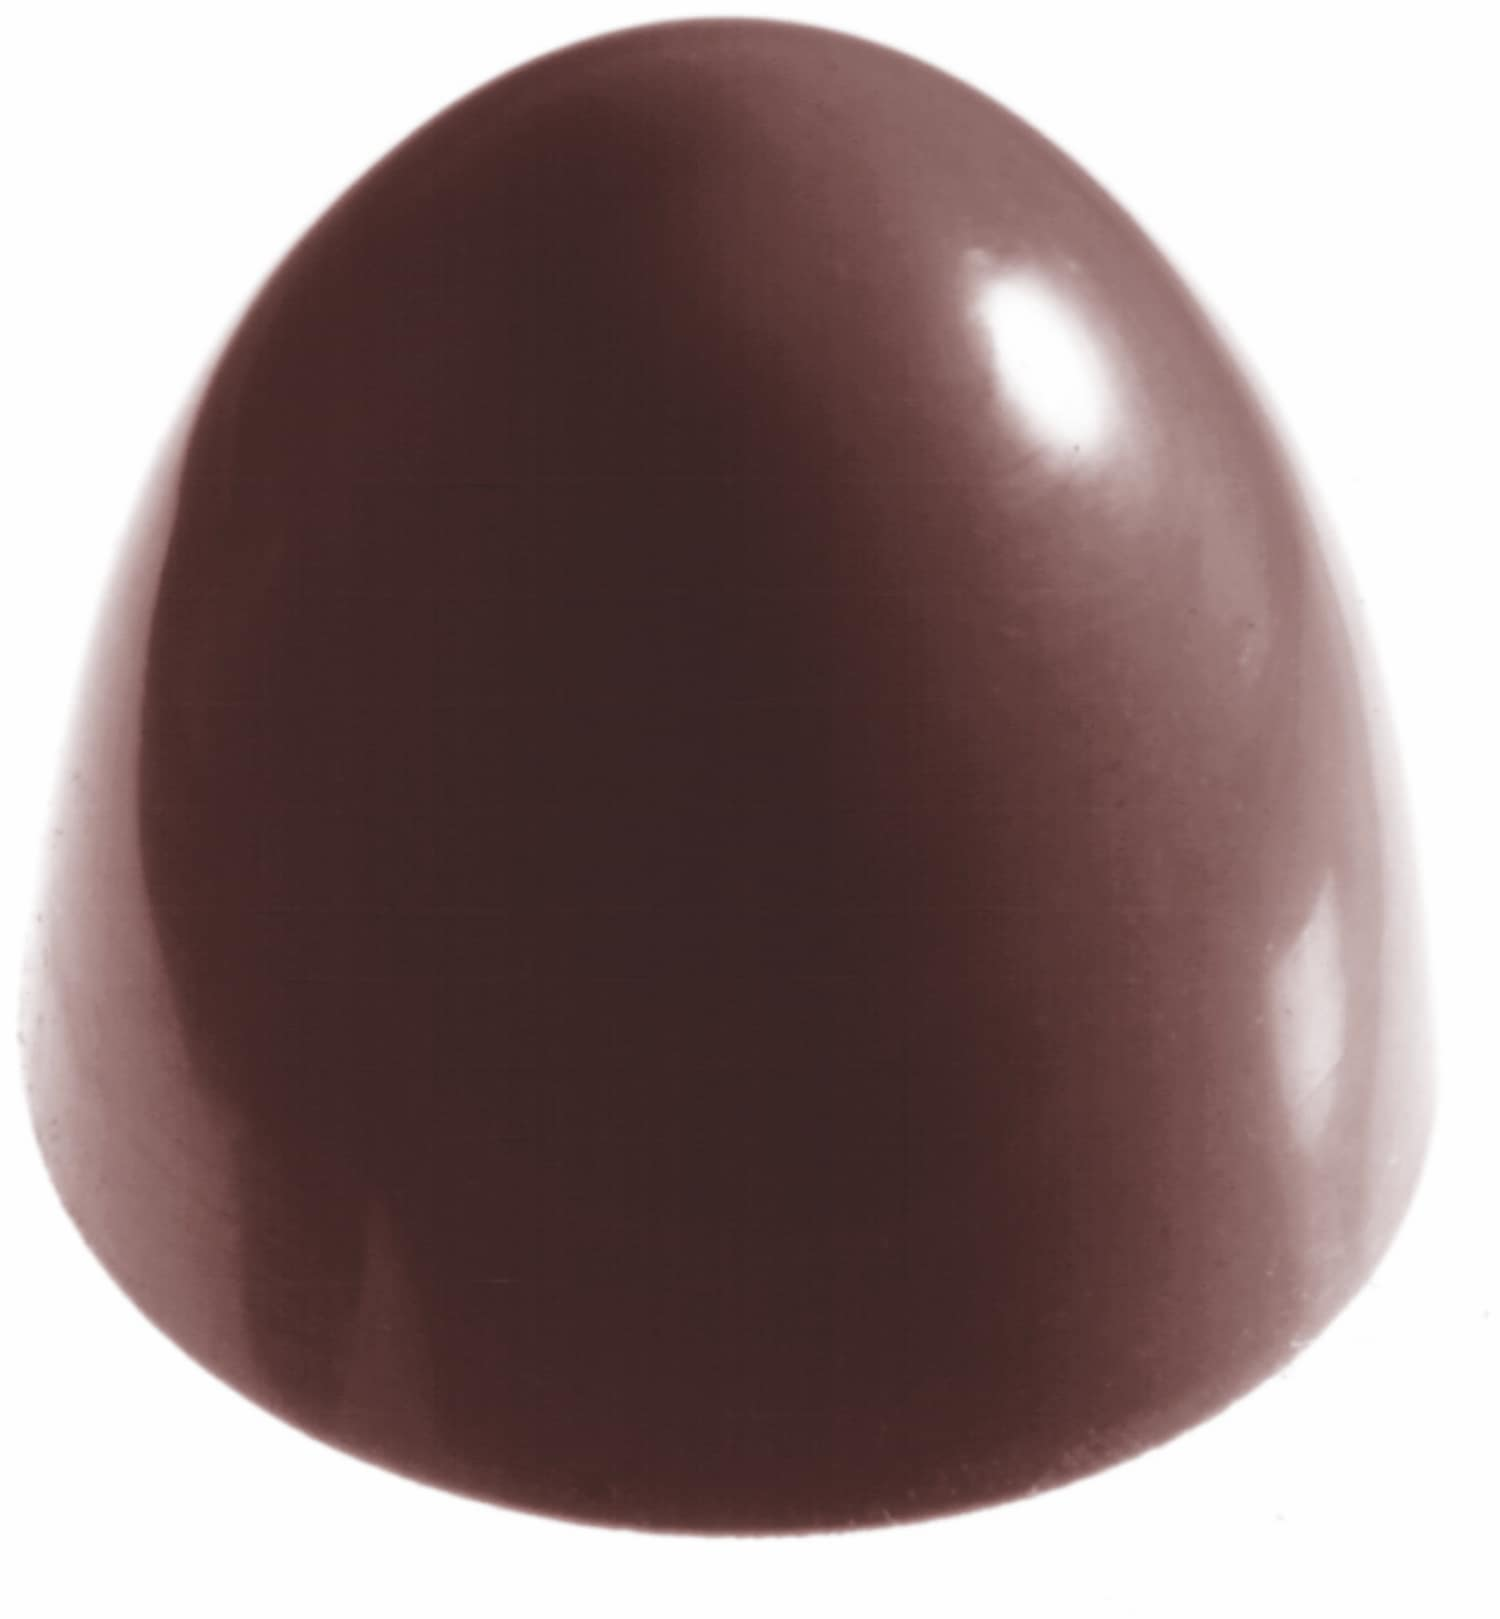 "Schokoladenform ""Kugel"" 421292"